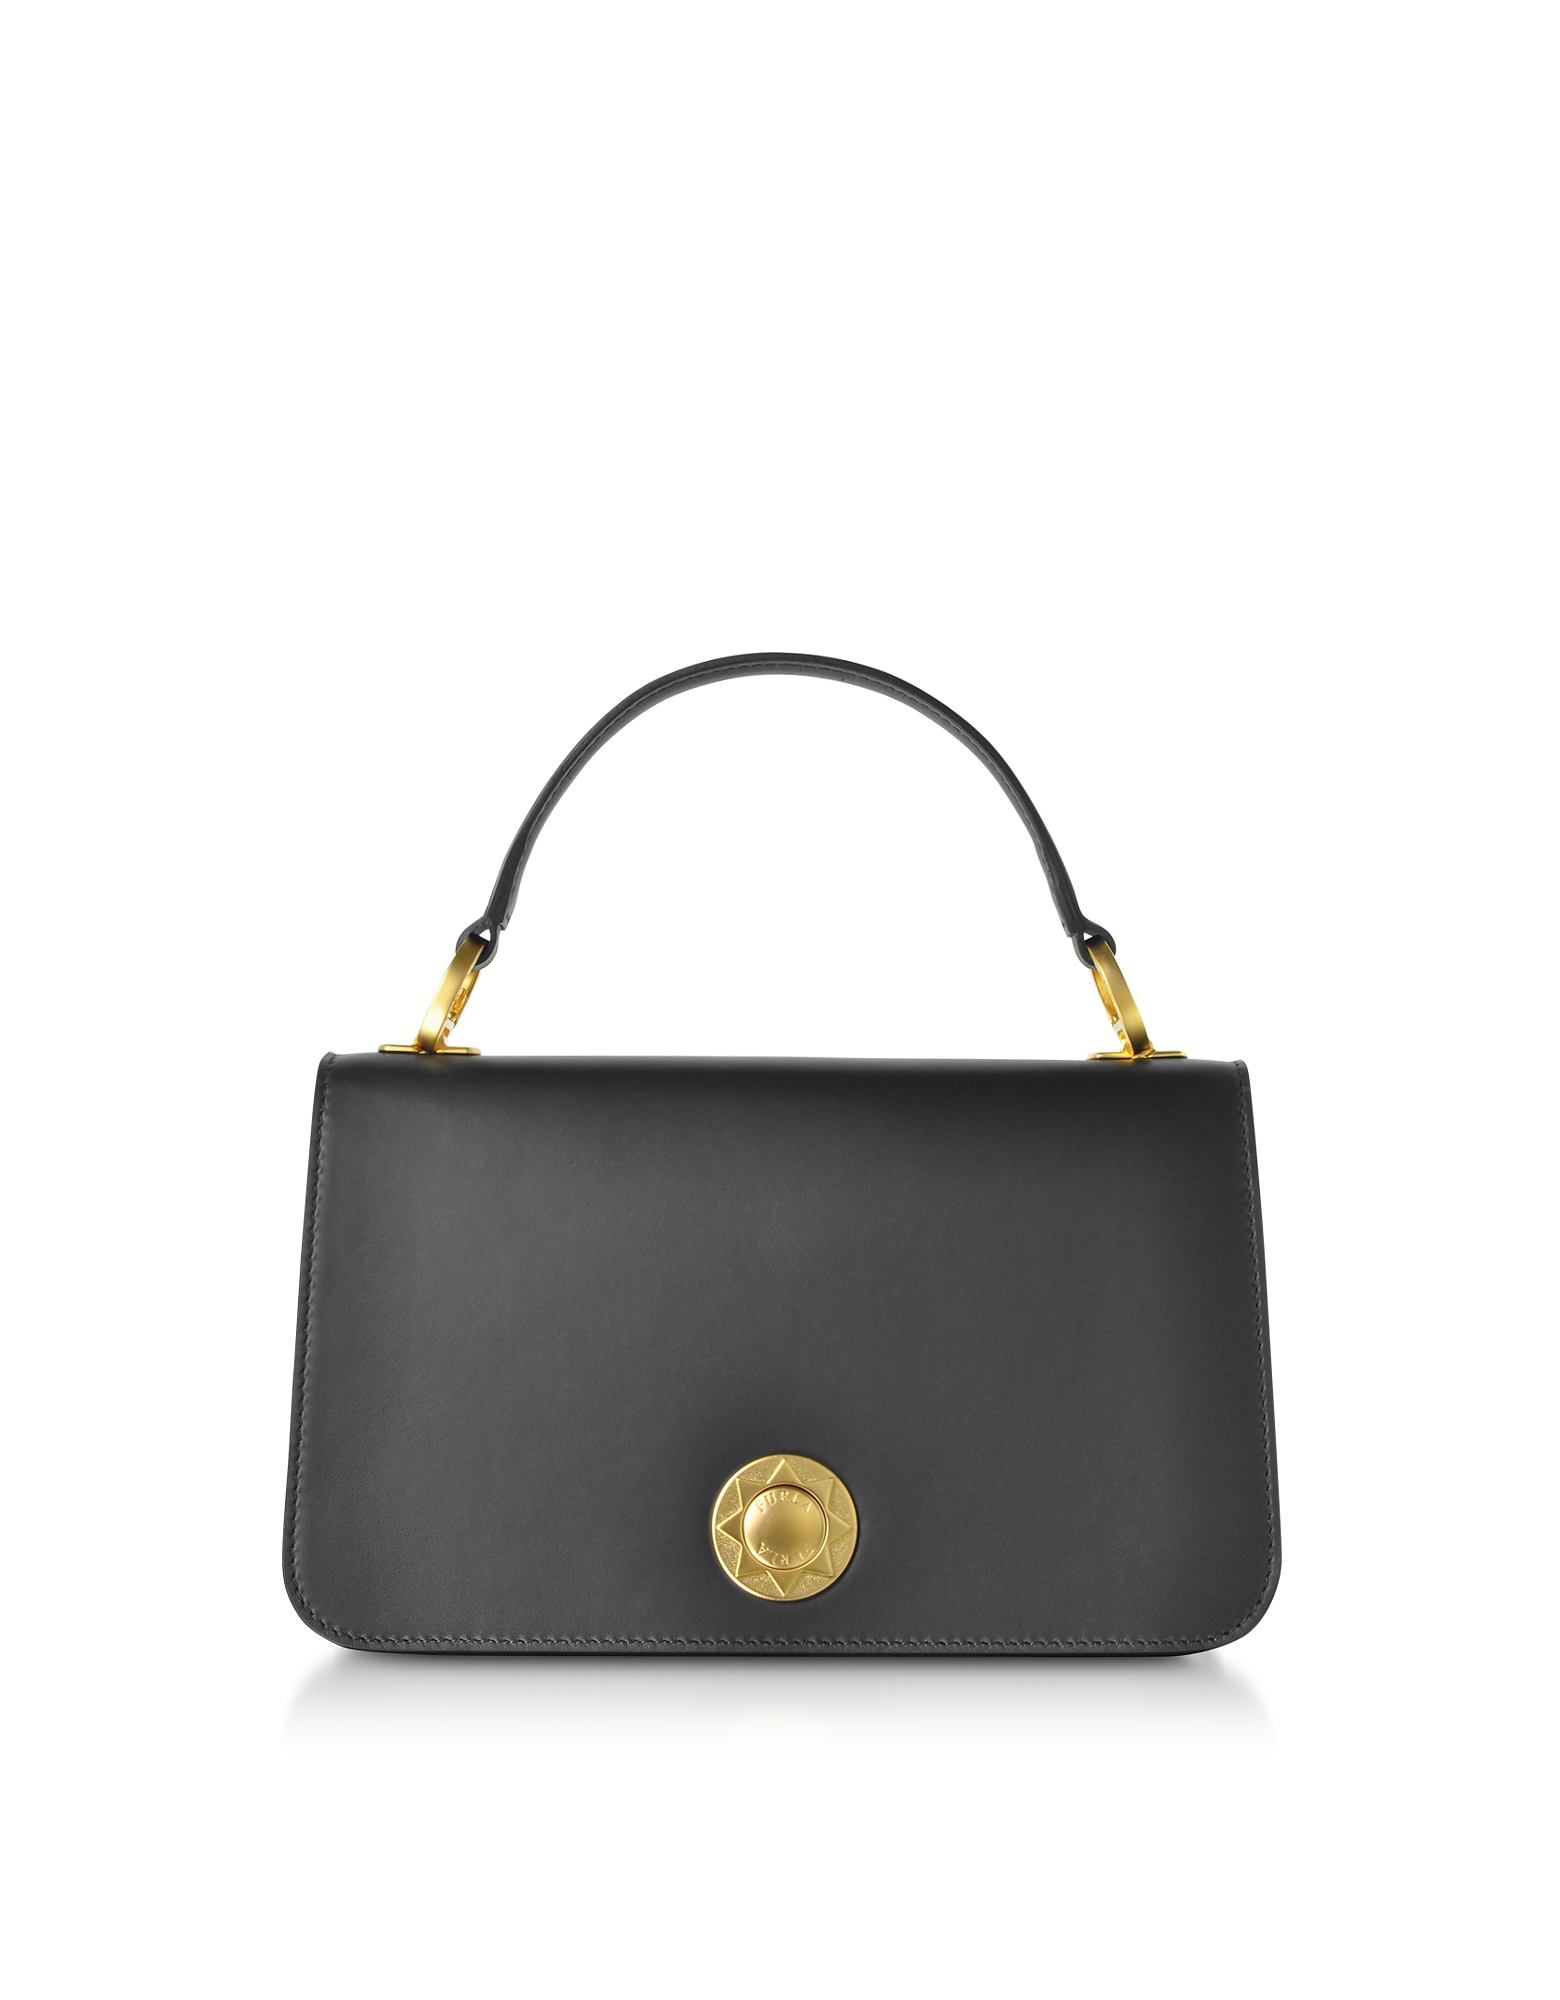 Luna Small Top Handle Bag in Black Onyx